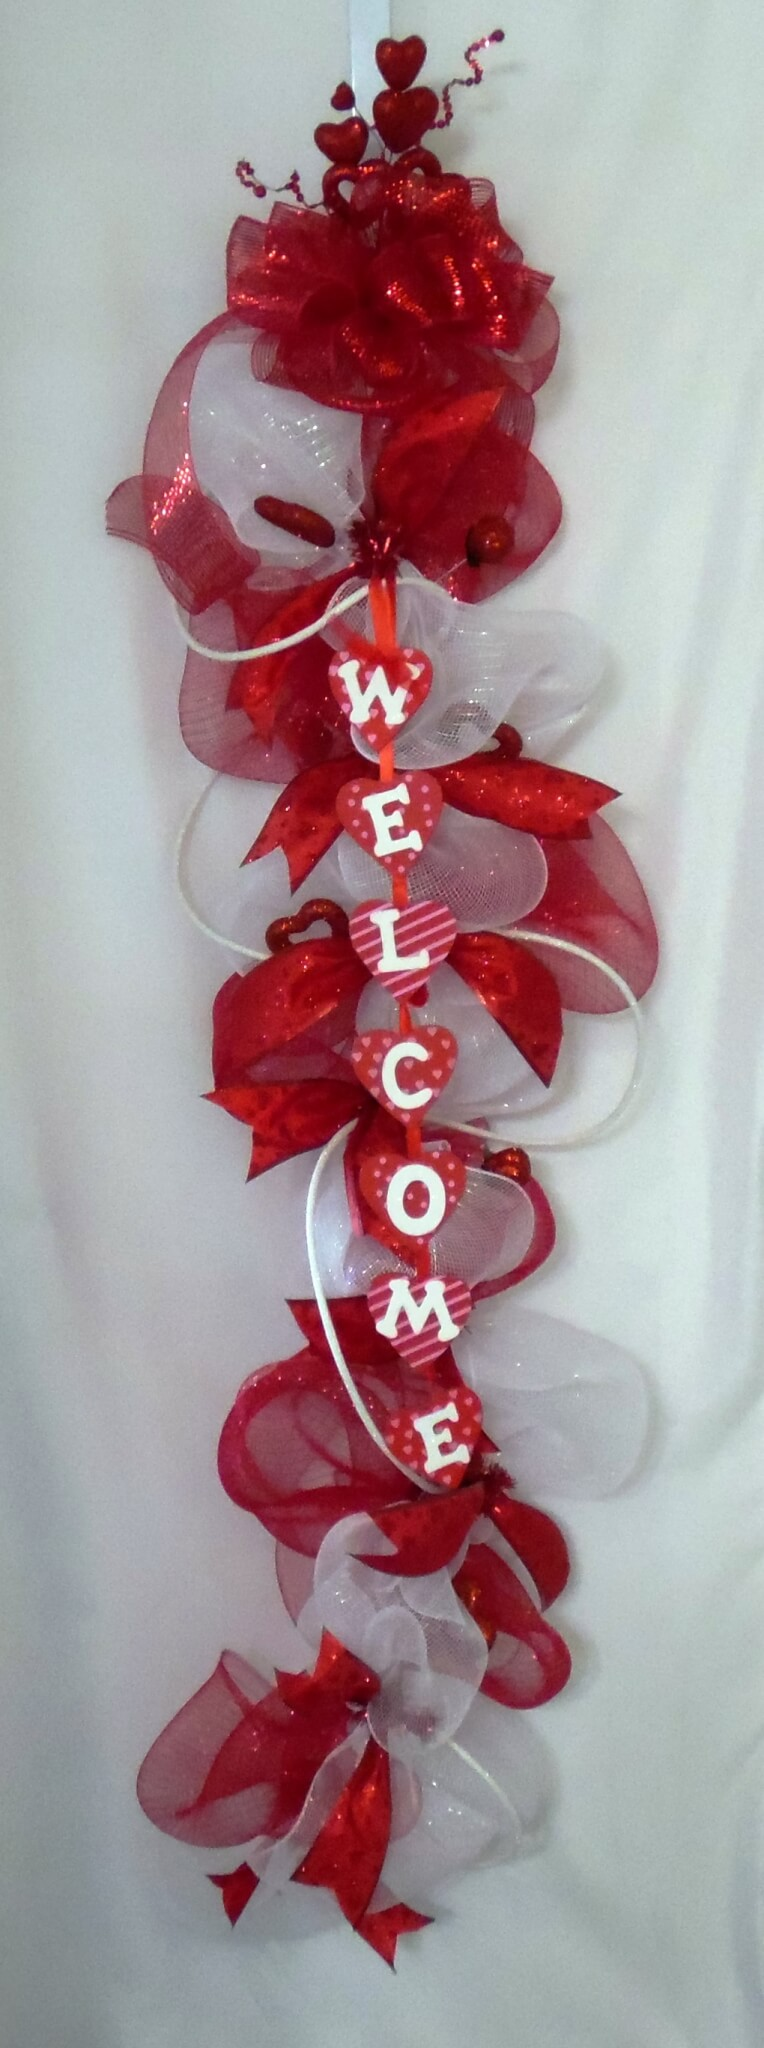 Valentines Day Welcome Door Swag Wreaths Garland